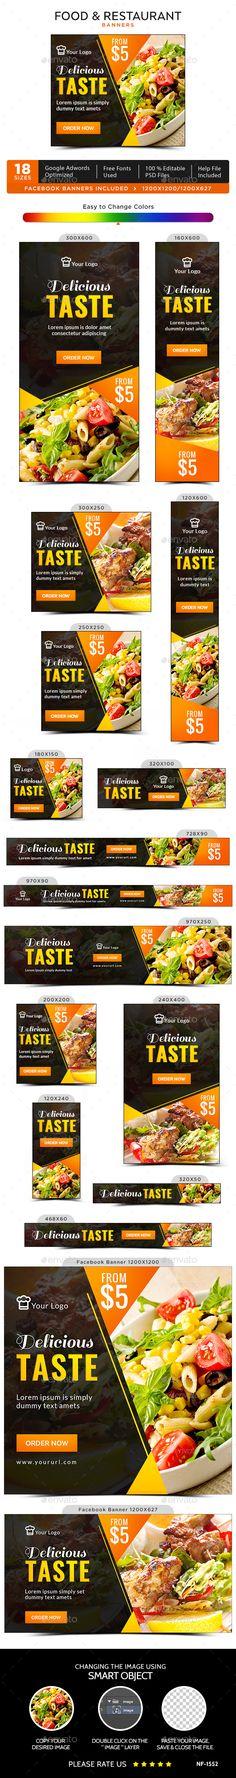 Food & Restaurant Banners Template PSD